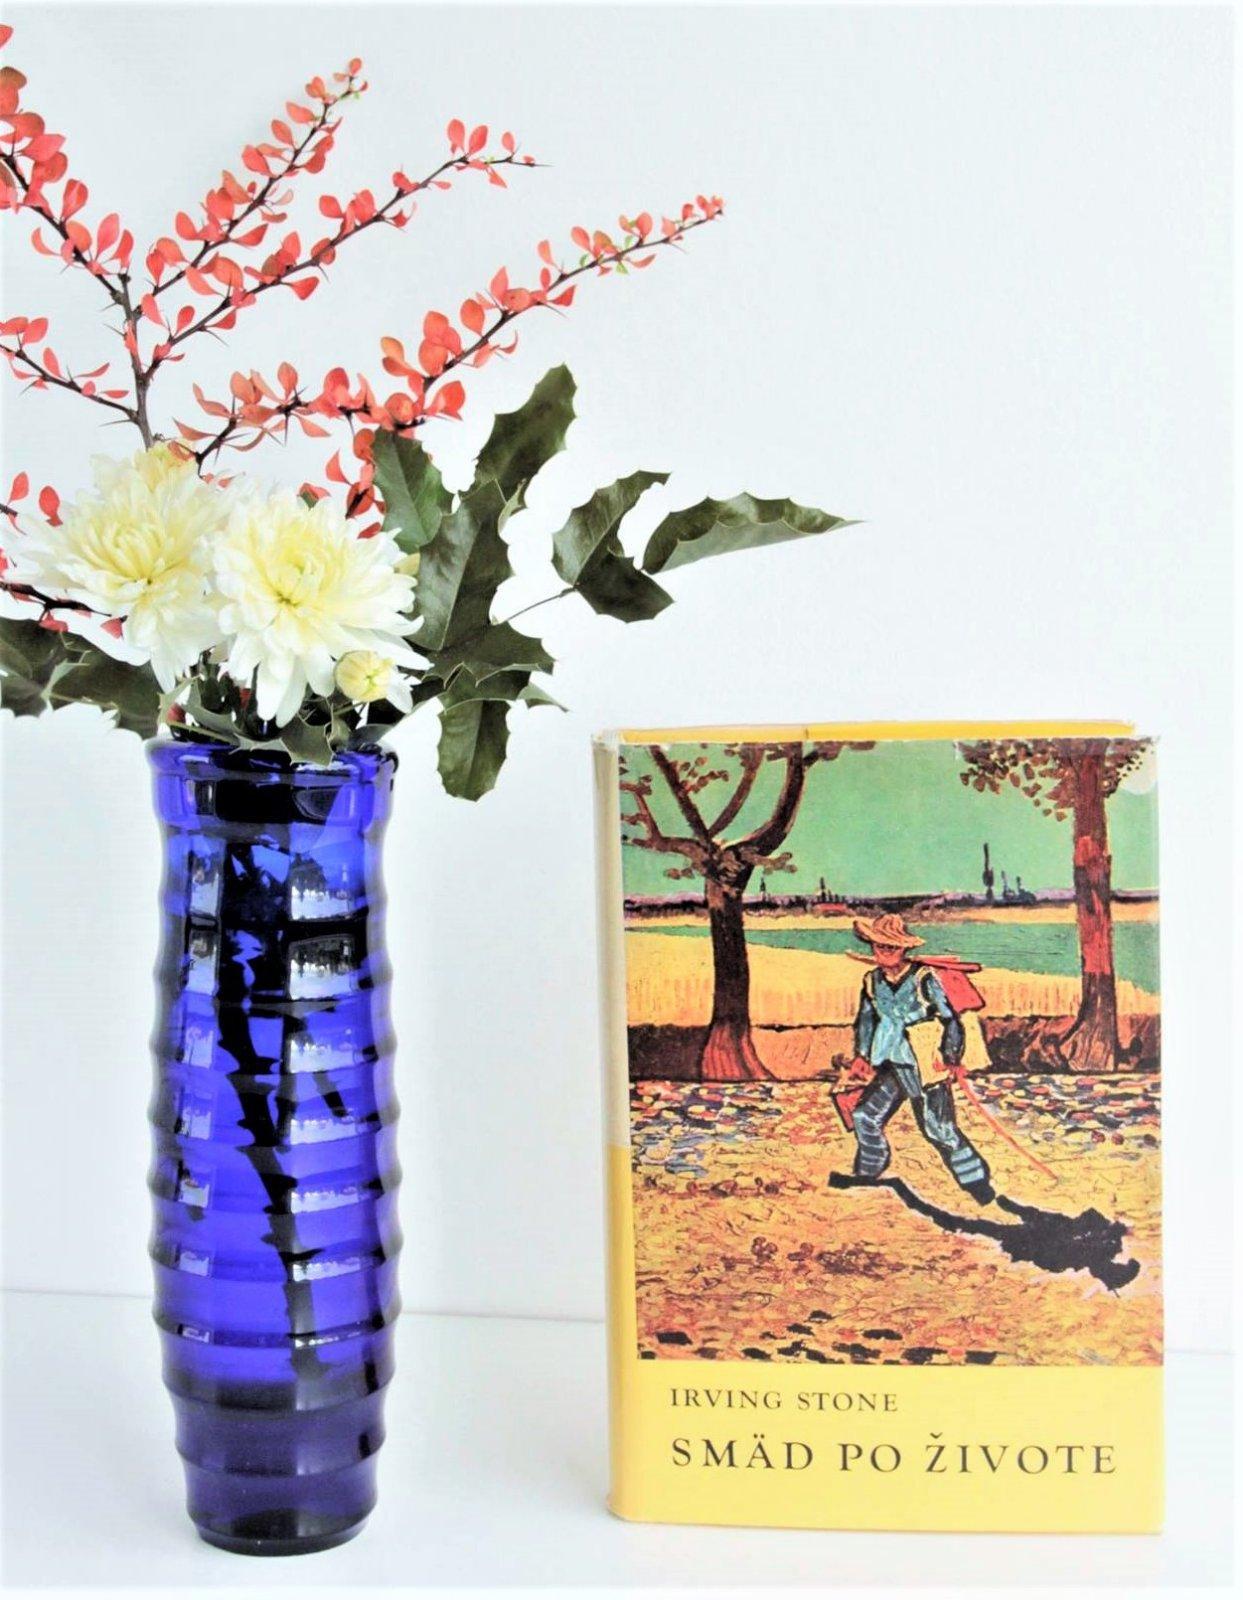 van gogh flowers in a blue vase of irving stone sma¤d po a¾ivote vincent van gogh 5 e od inside zobraz cela podmienky